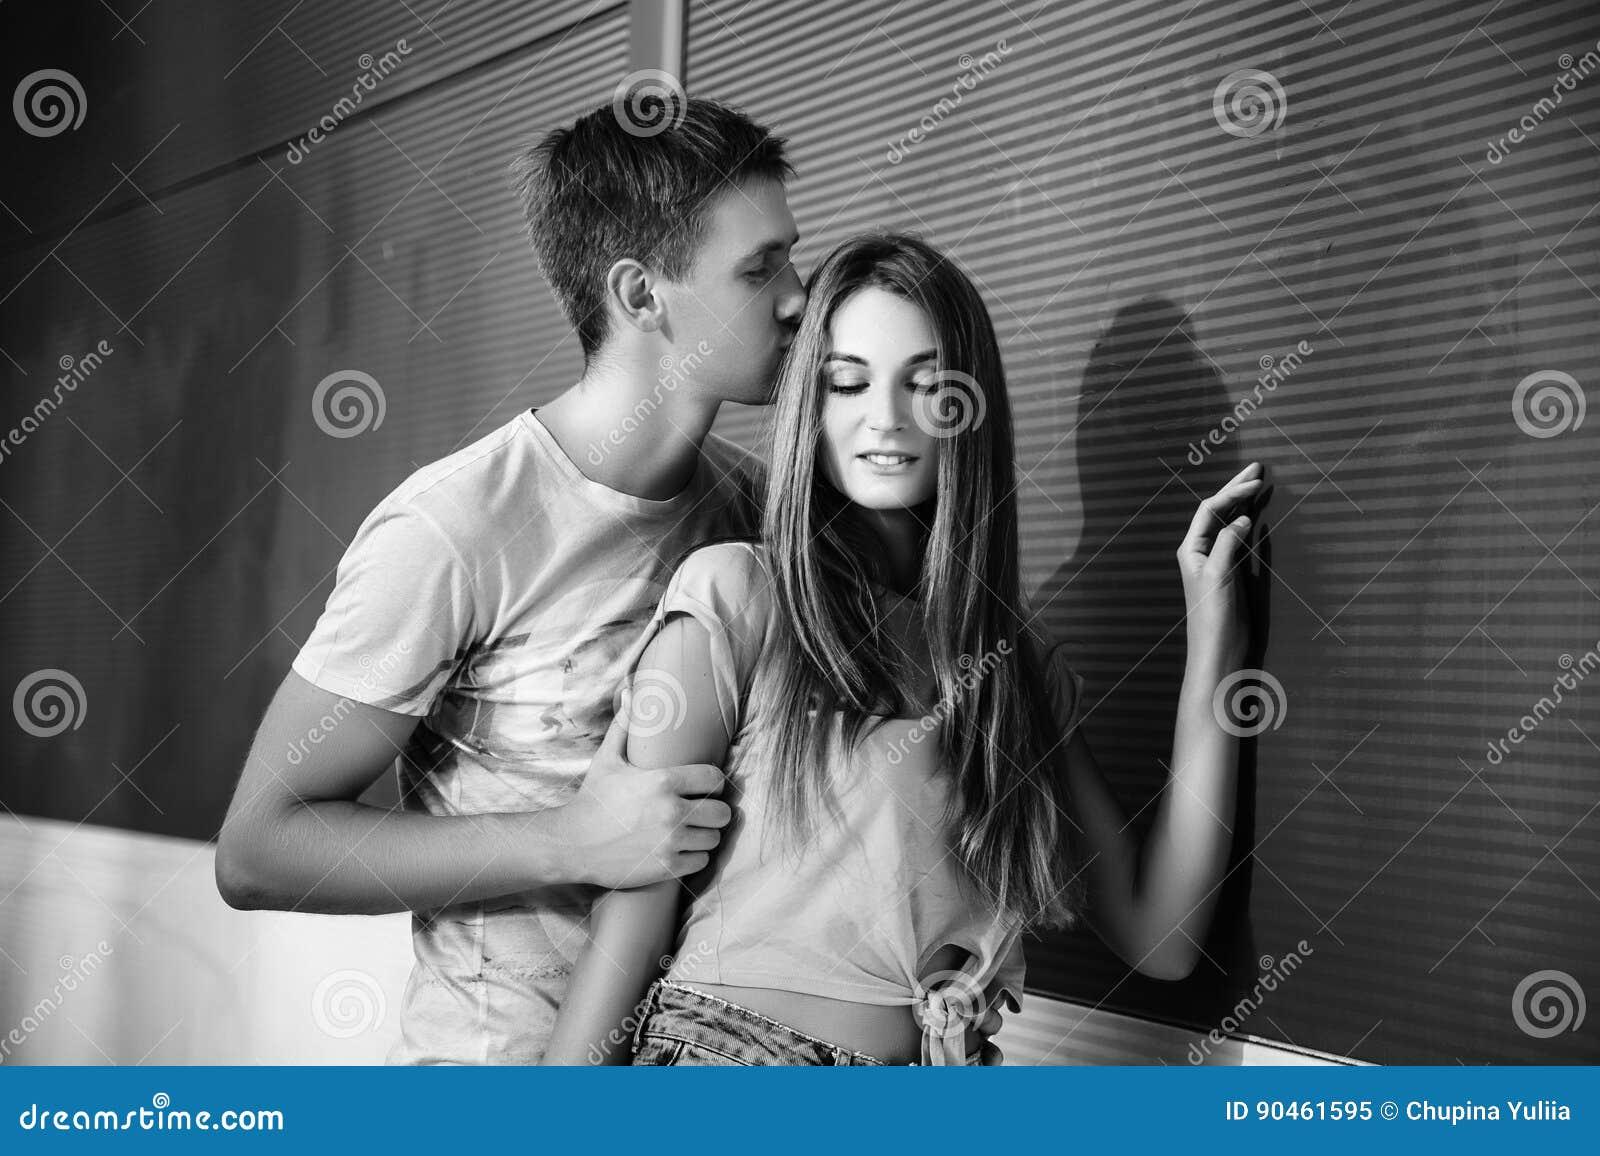 Black Guy Pounds White Girl